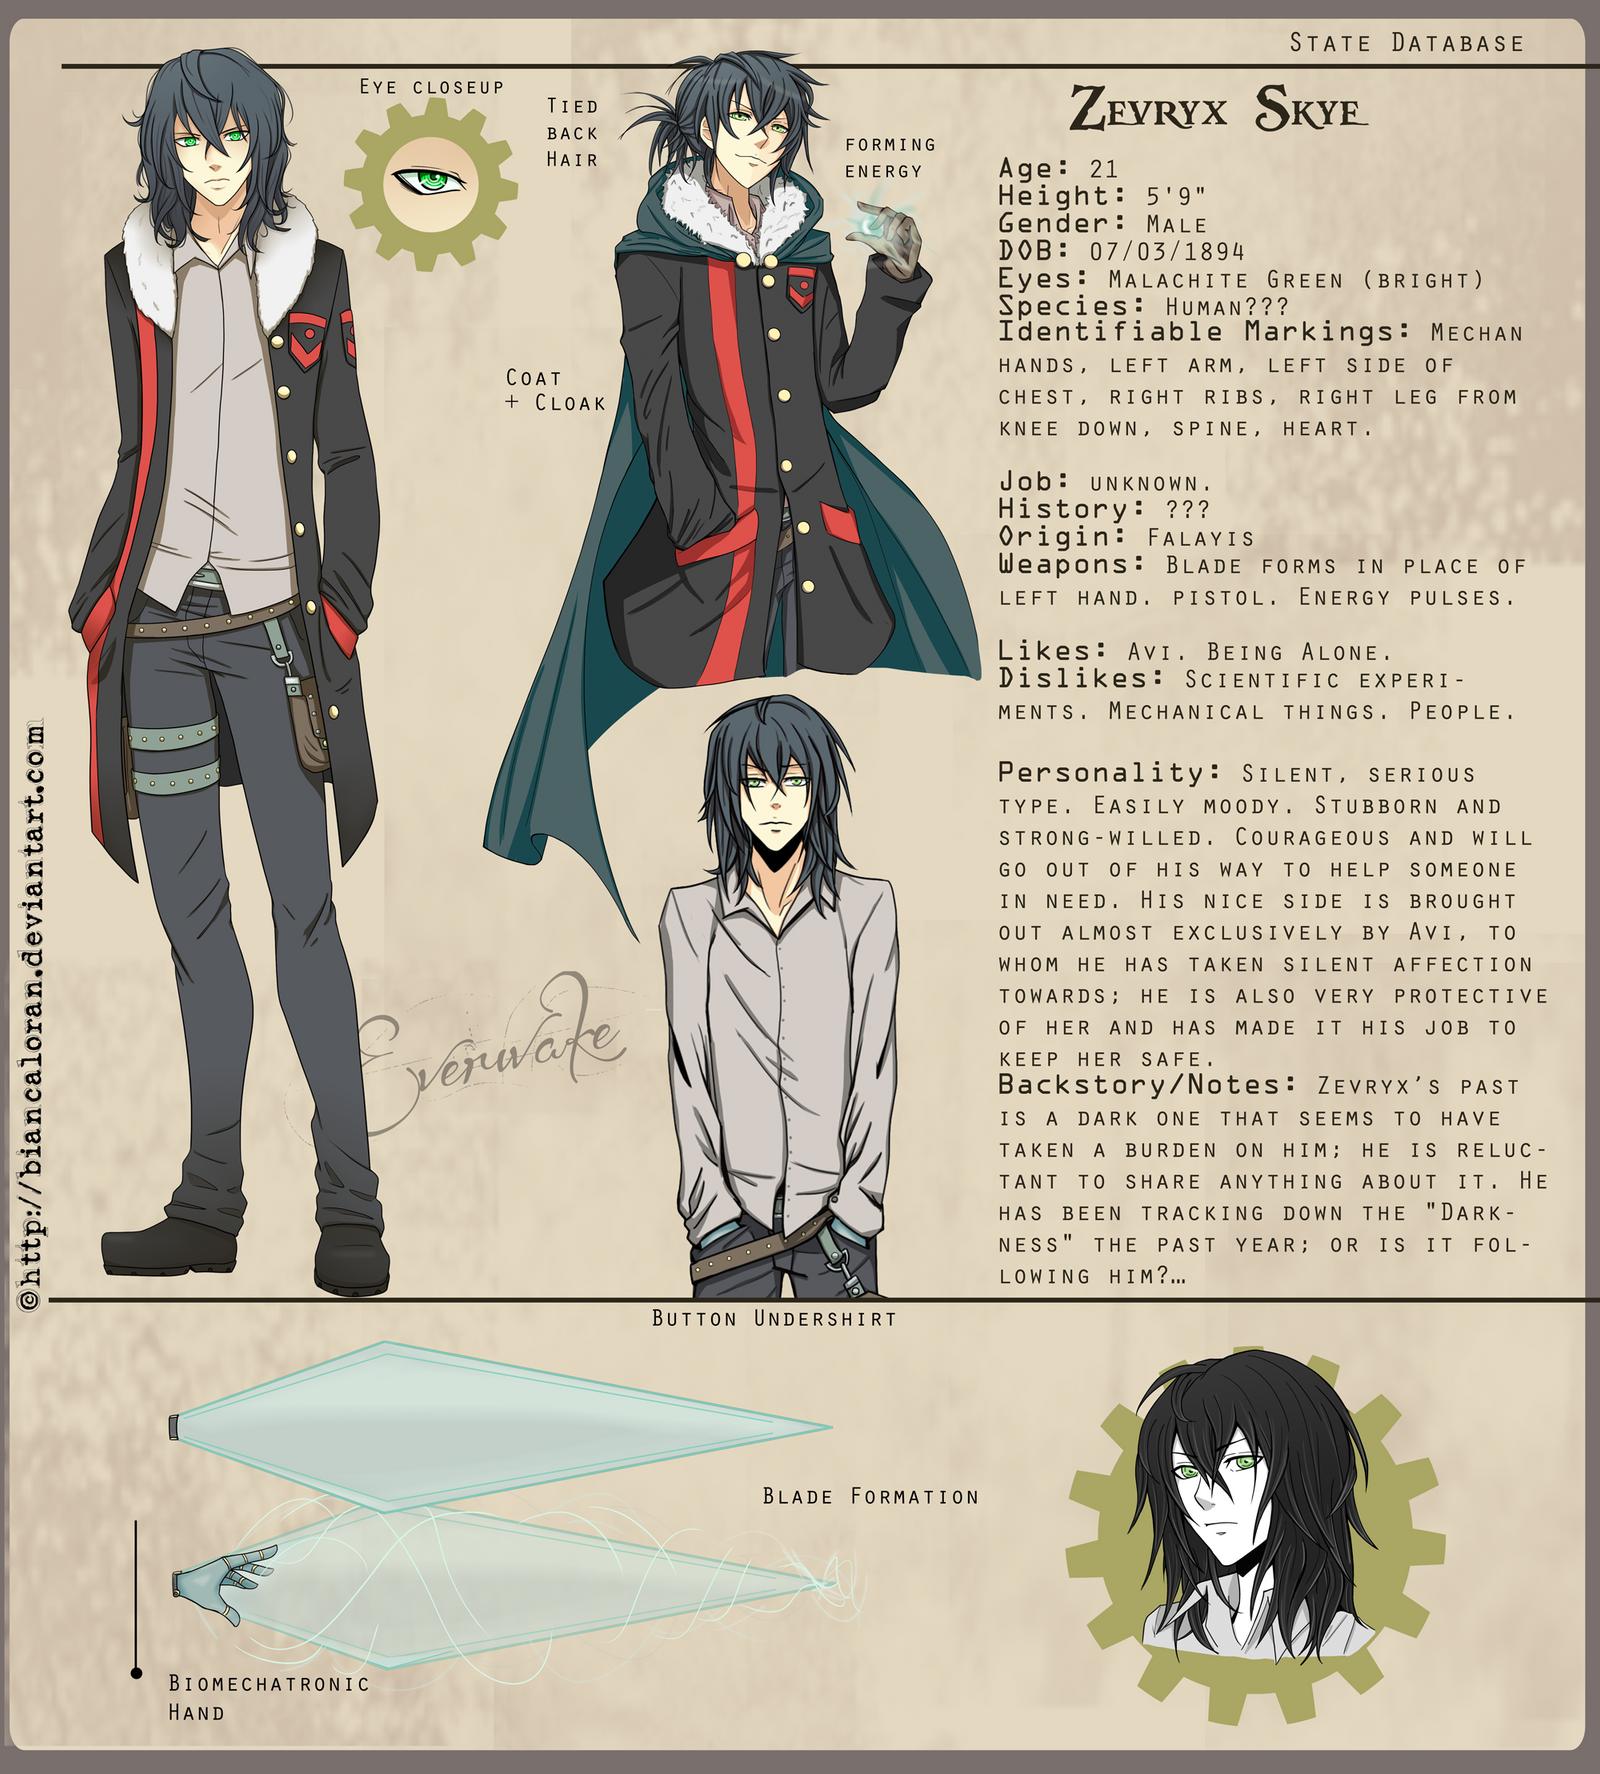 Zevryx Skye - Character Sheet by biancaloran